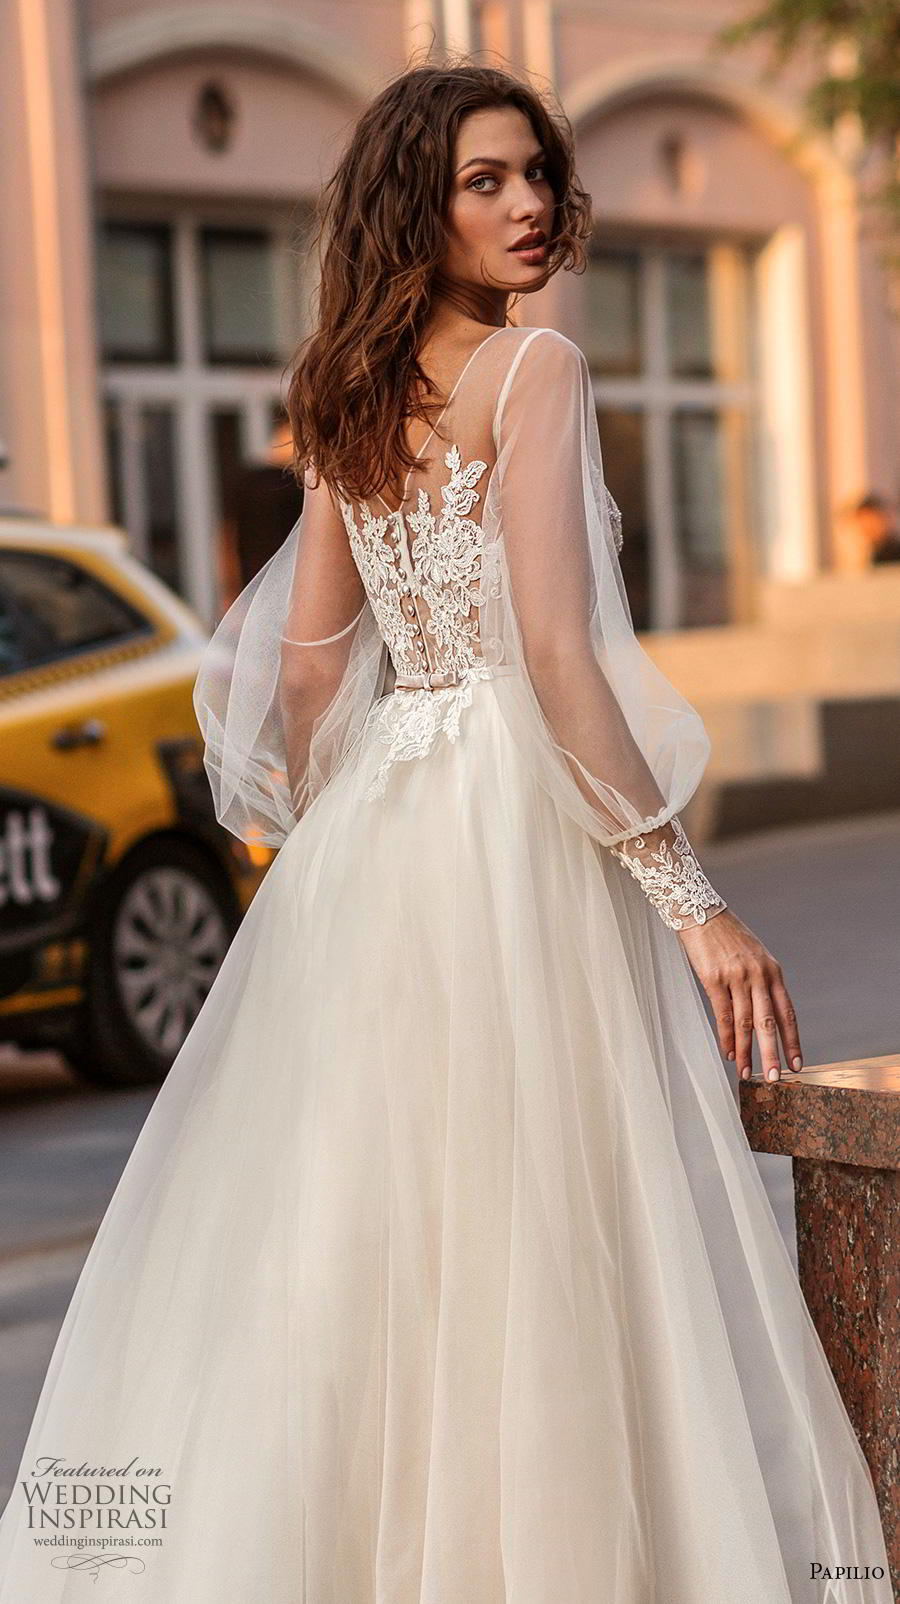 papilio 2019 bridal long bishop sleeves illusion bateau sweetheart neckline heavily embellished bodice soft a  line wedding dress lace back chapel train (6) zbv